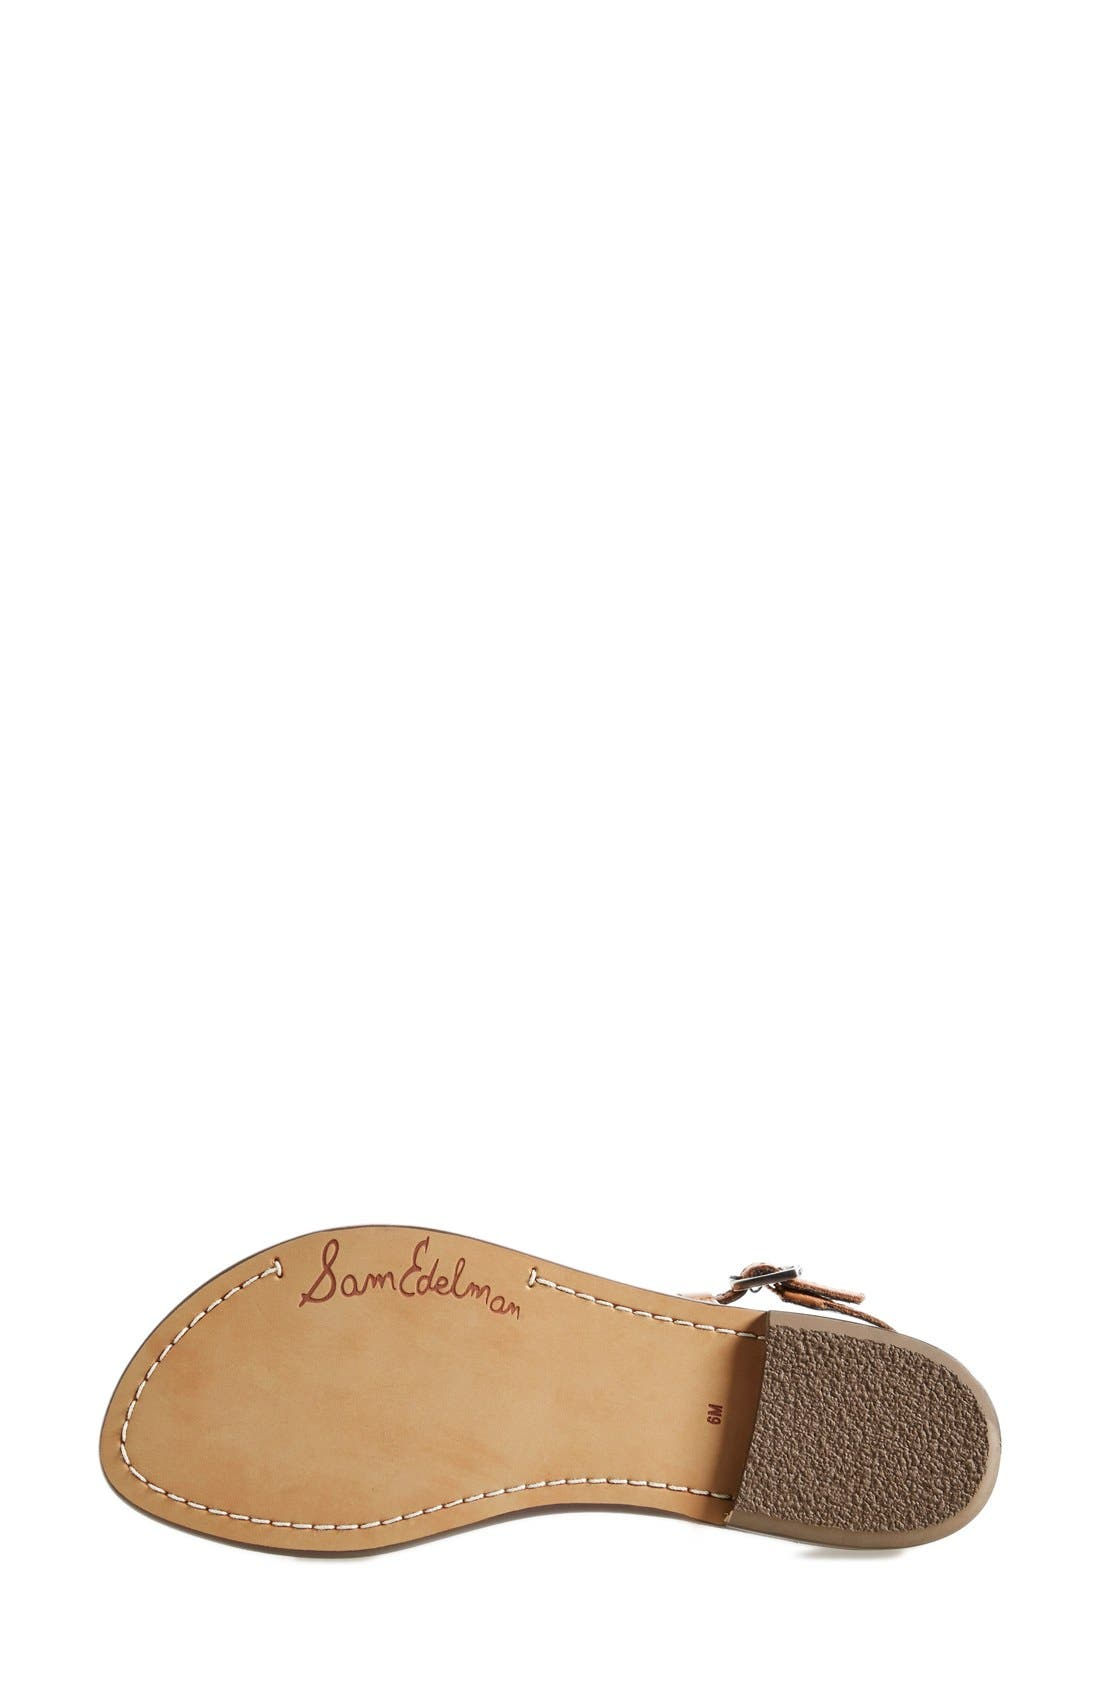 'Gigi' Leather Sandal,                             Alternate thumbnail 2, color,                             045